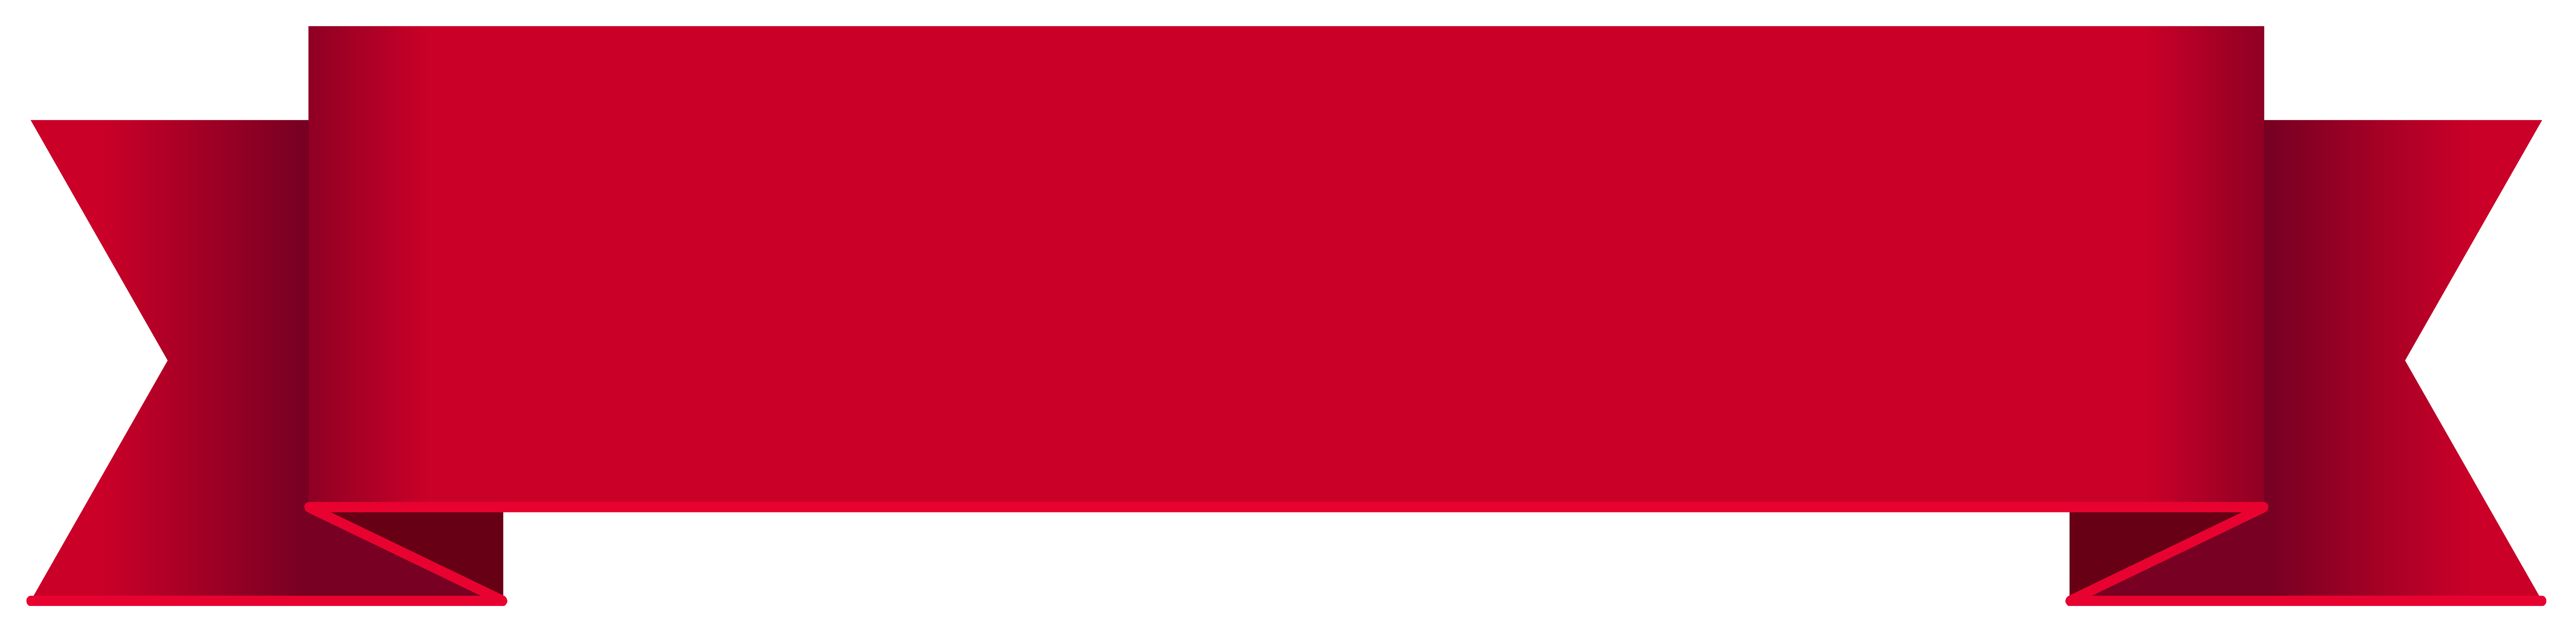 Clipart banner. Png clip art image